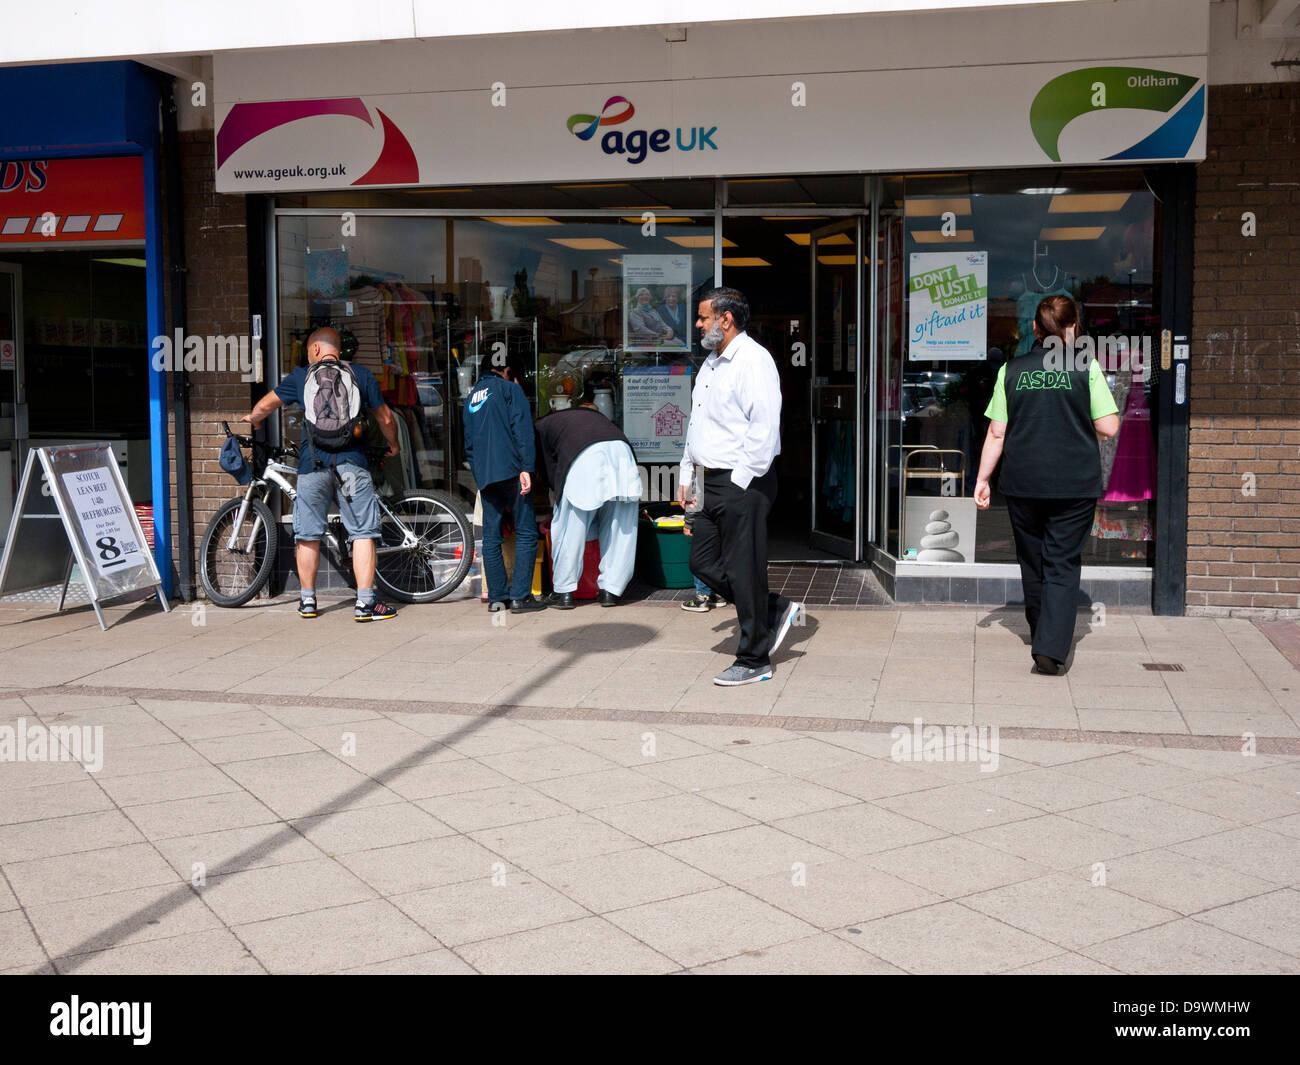 'Age UK' charity shop, Chadderton, Greater Manchester, UK. - Stock Image